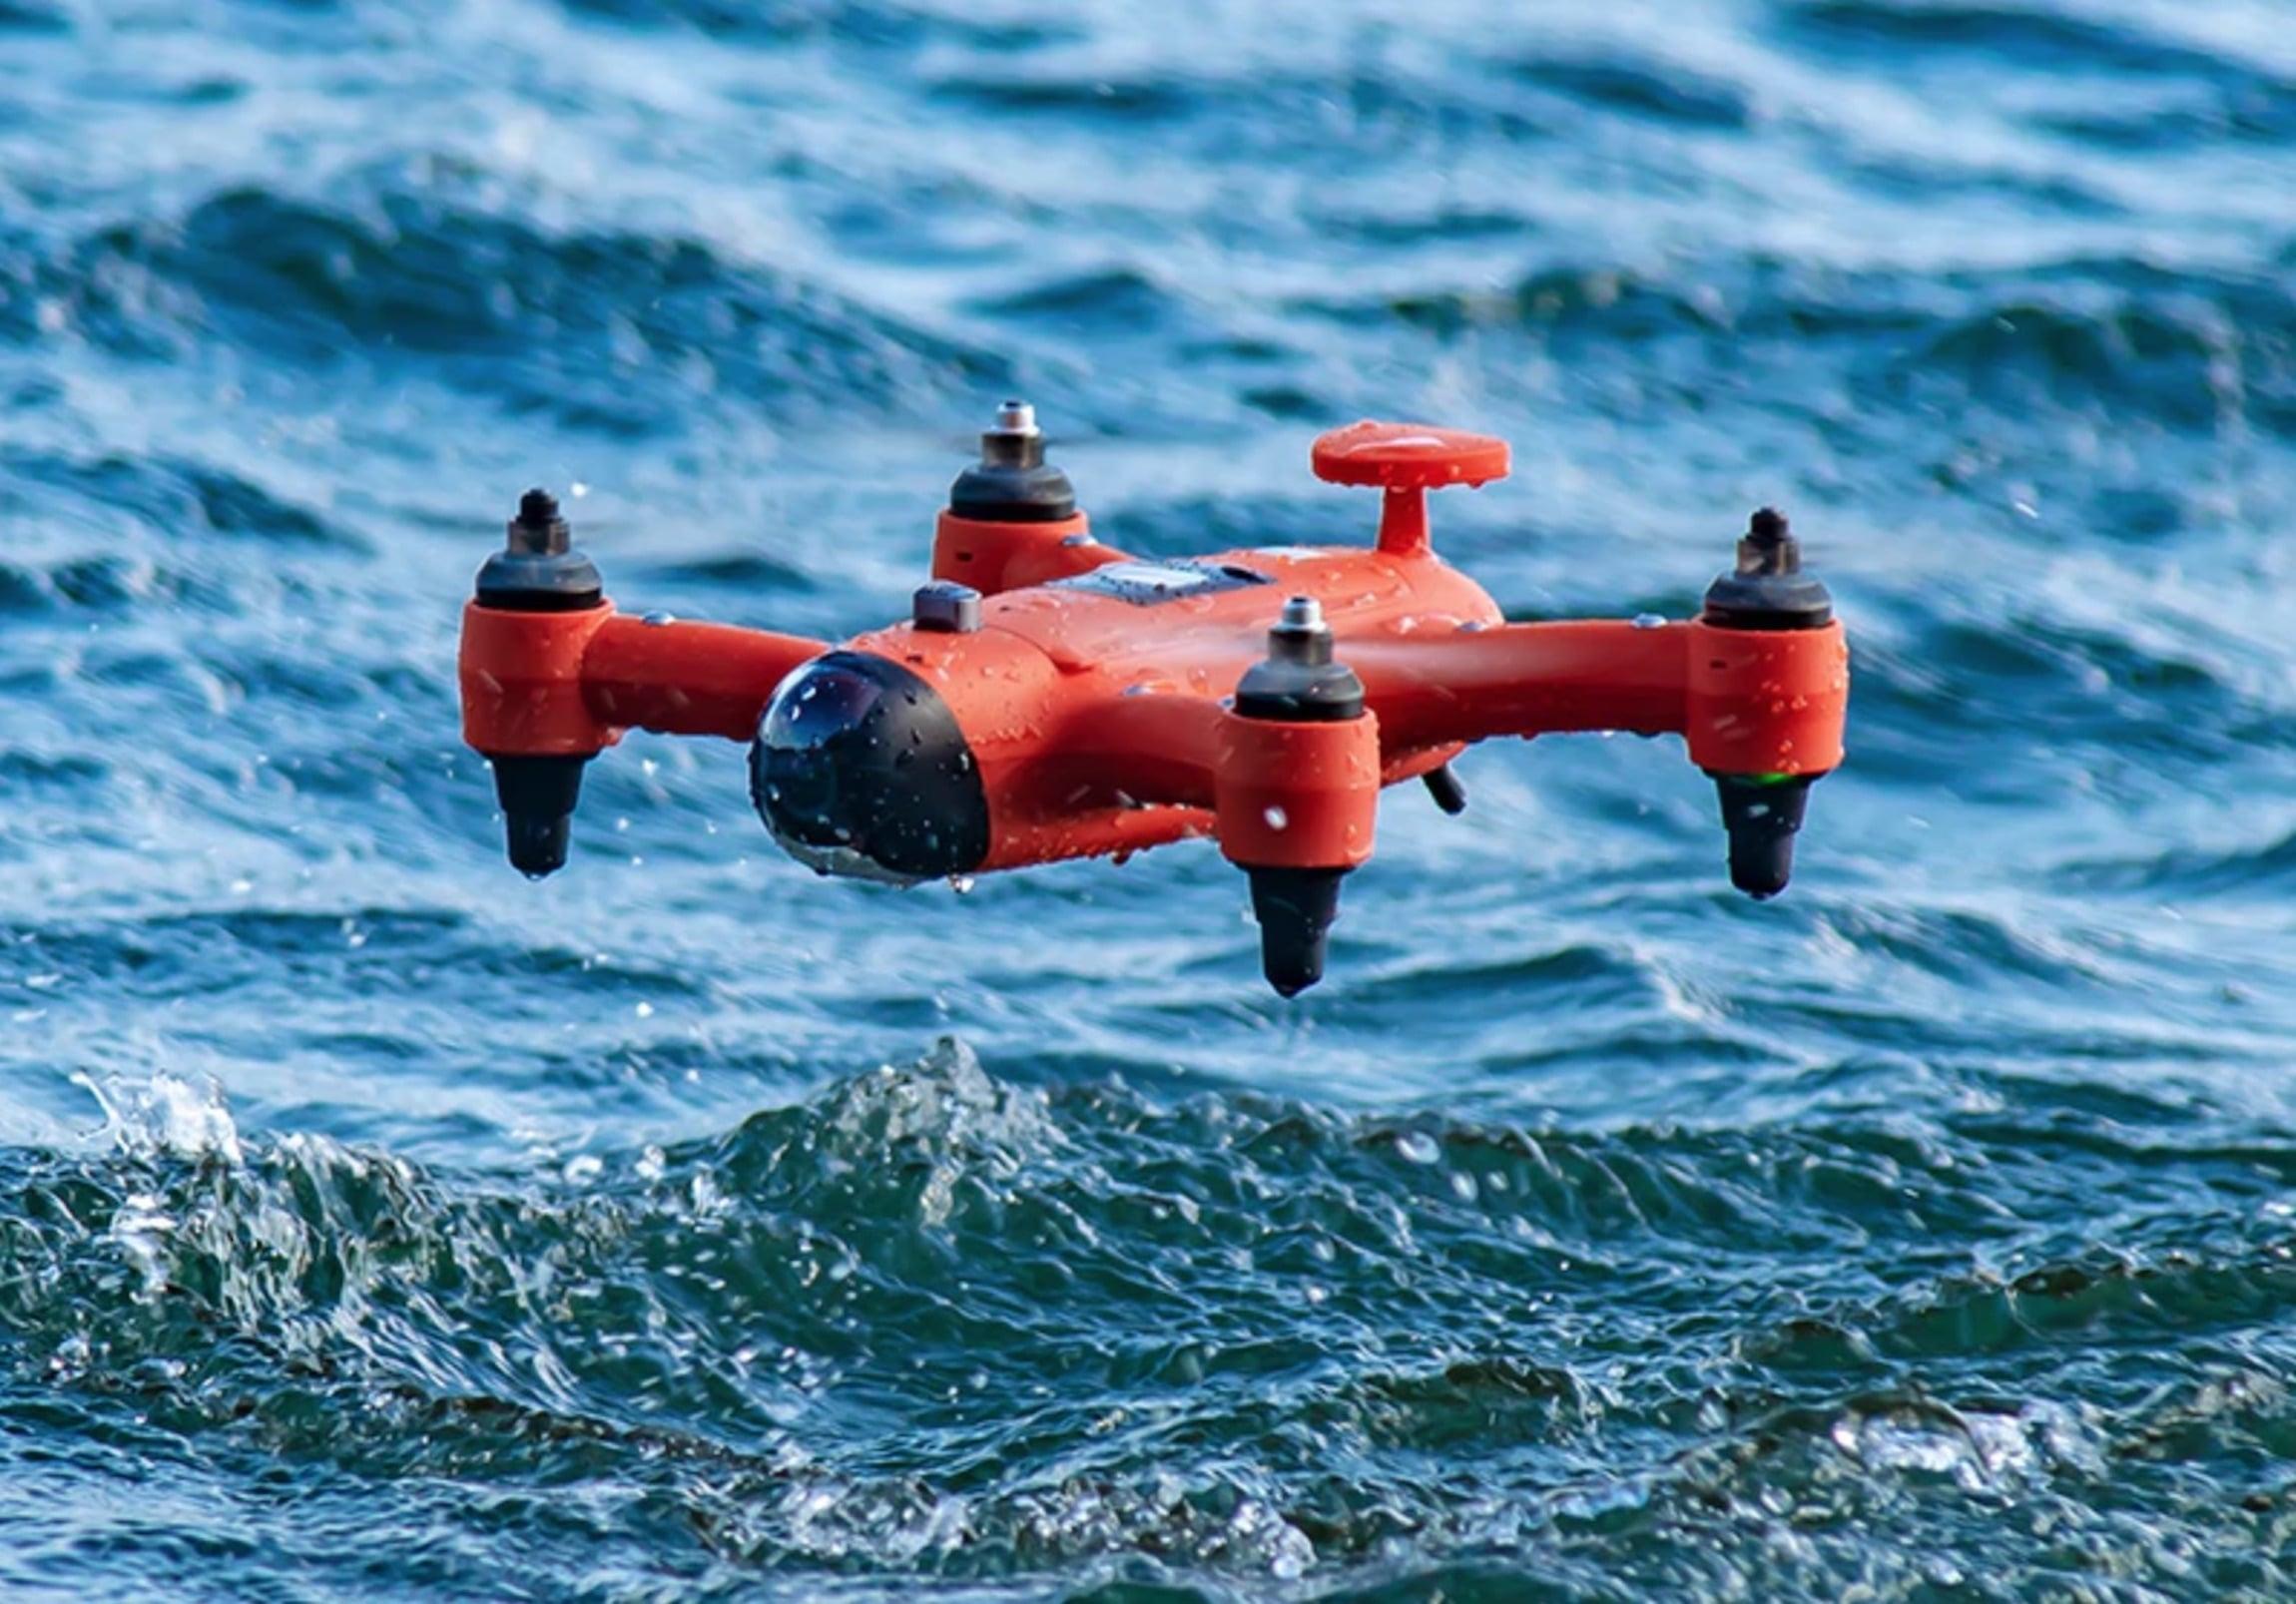 SwellPro-Spry-Waterproof-Drone-001